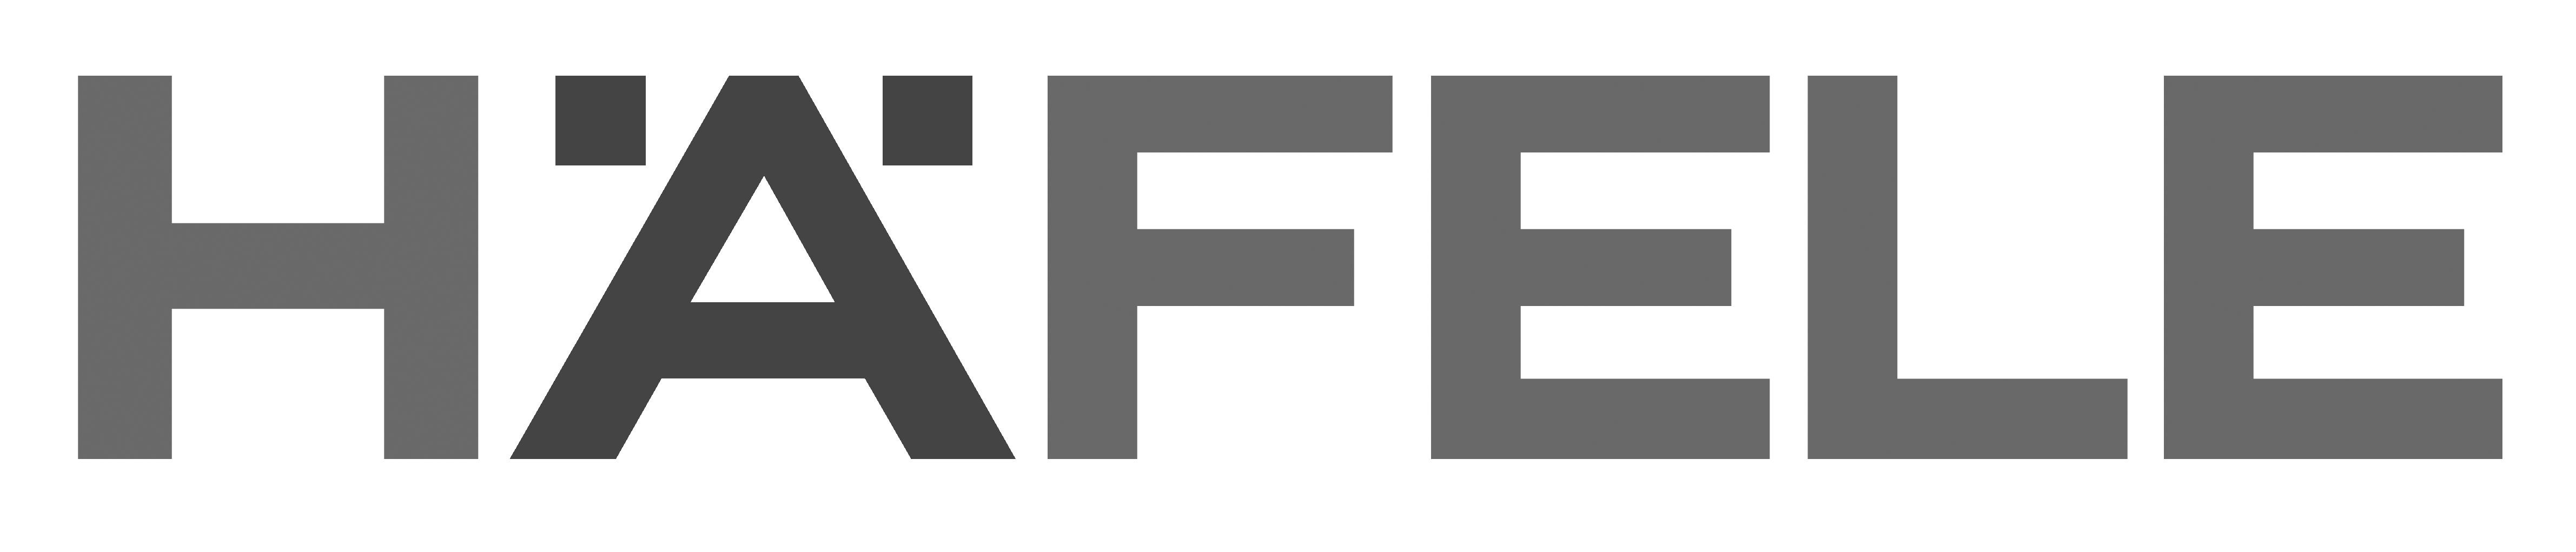 Hafele Products